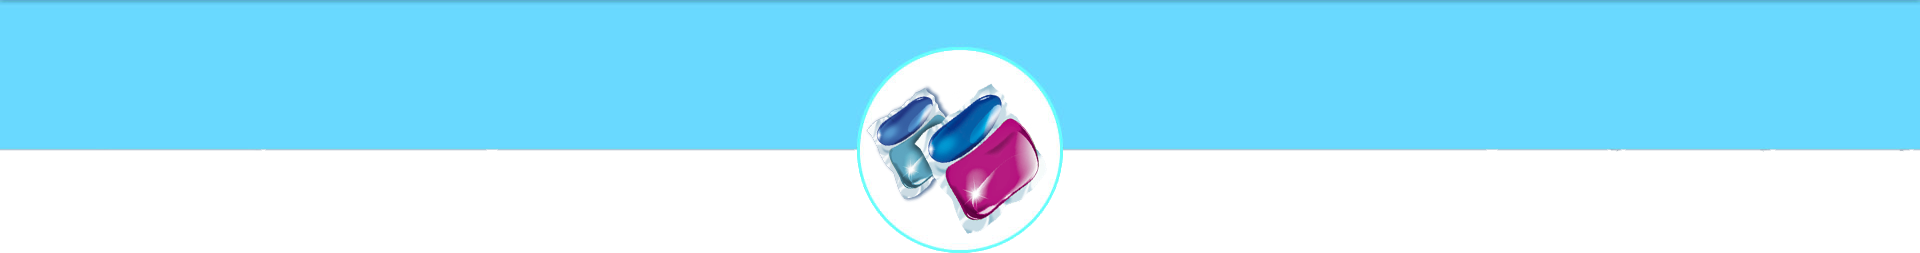 header_capsulas